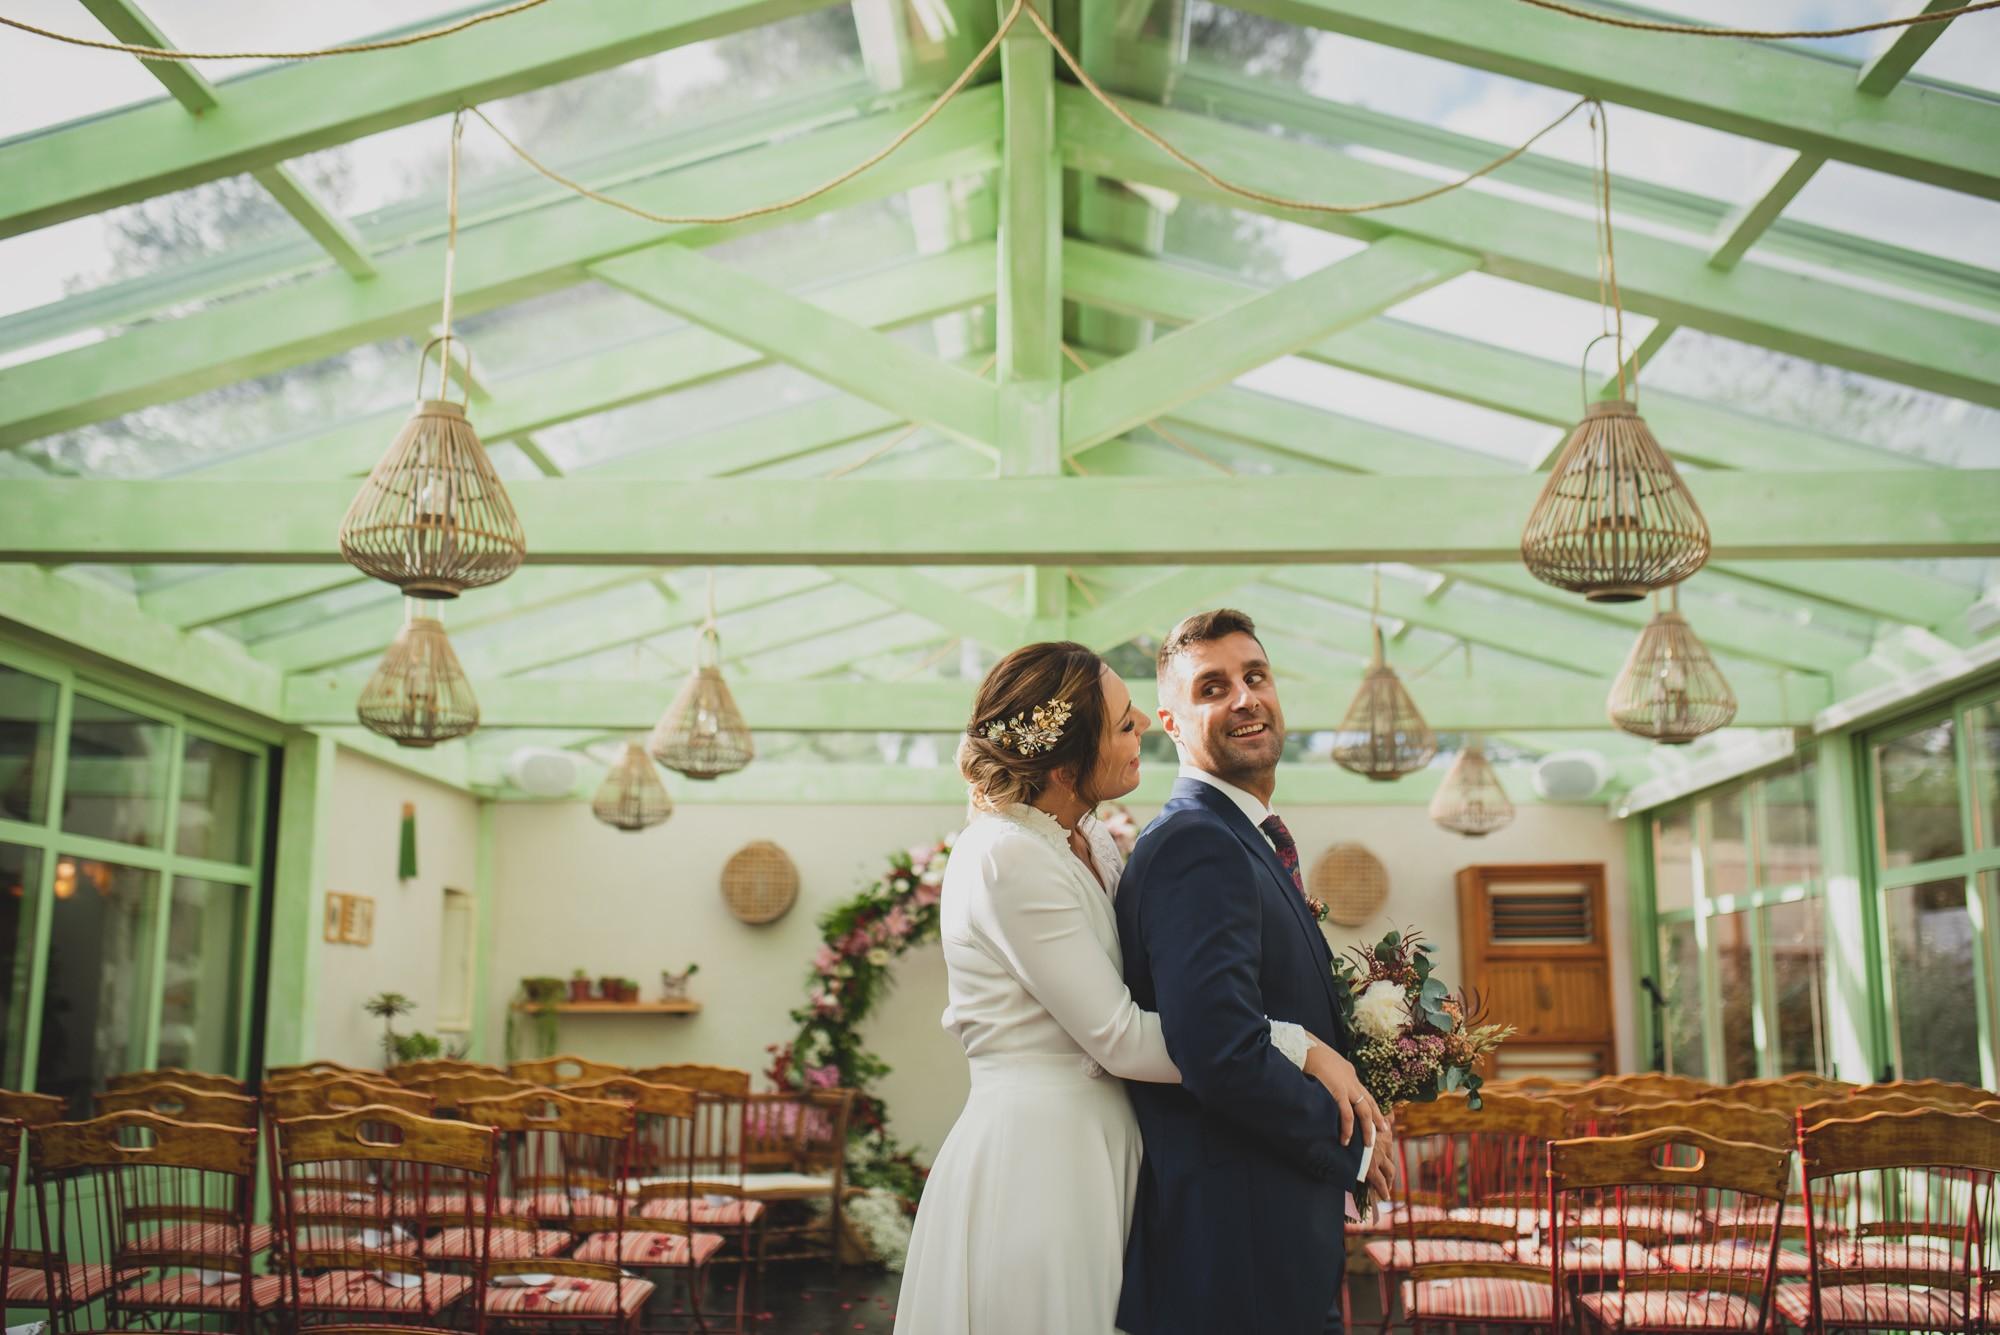 fotografos-boda-madrid 124838